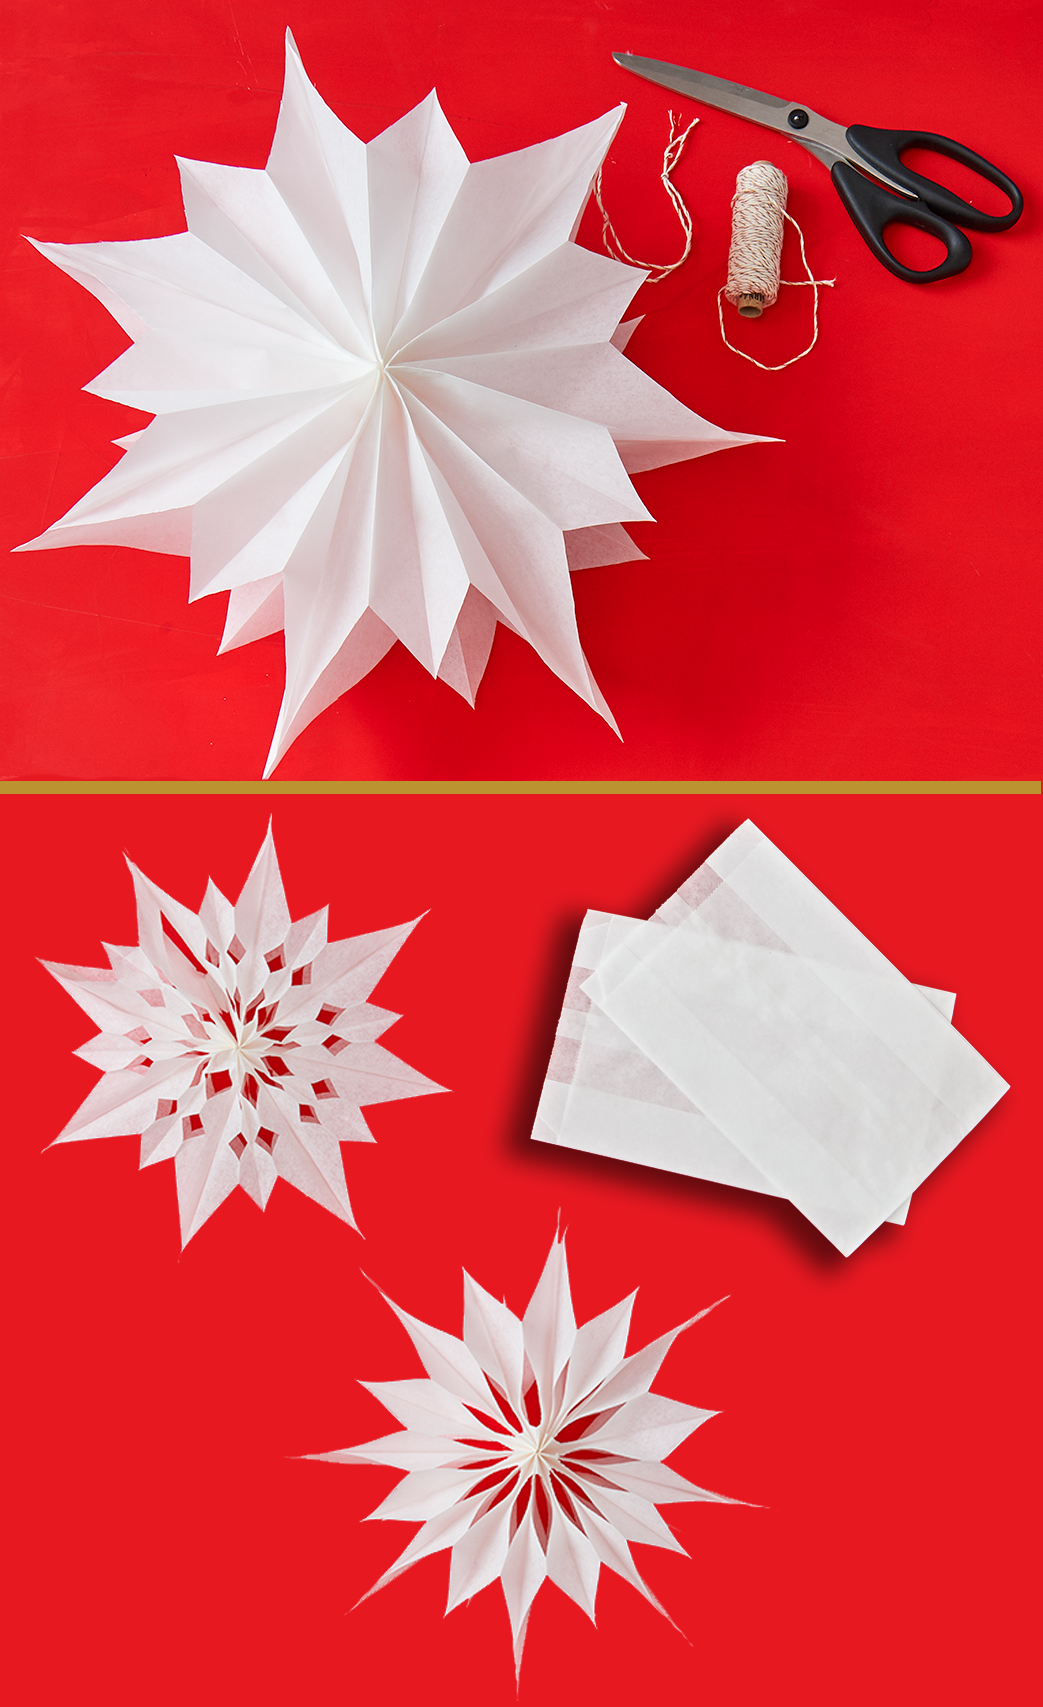 origami so bastelt ihr sterne aus butterbrott ten upcycling basteln basteln mit kindern. Black Bedroom Furniture Sets. Home Design Ideas